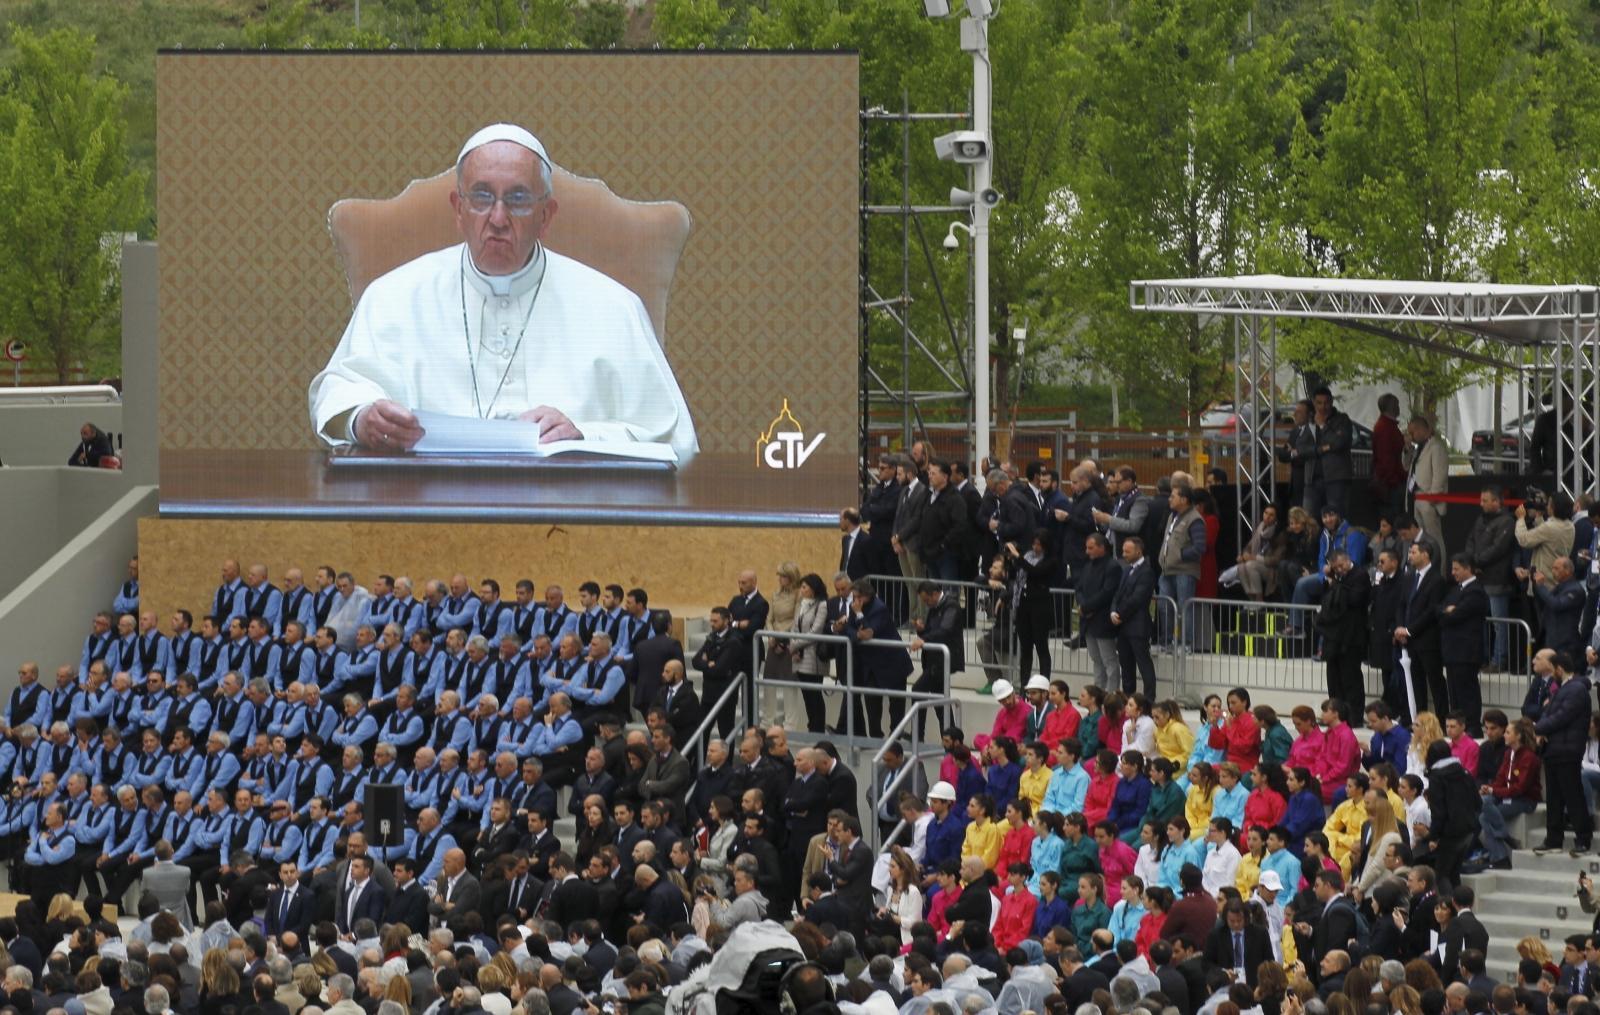 Expo Milano 2015 Vatican Pope Francis